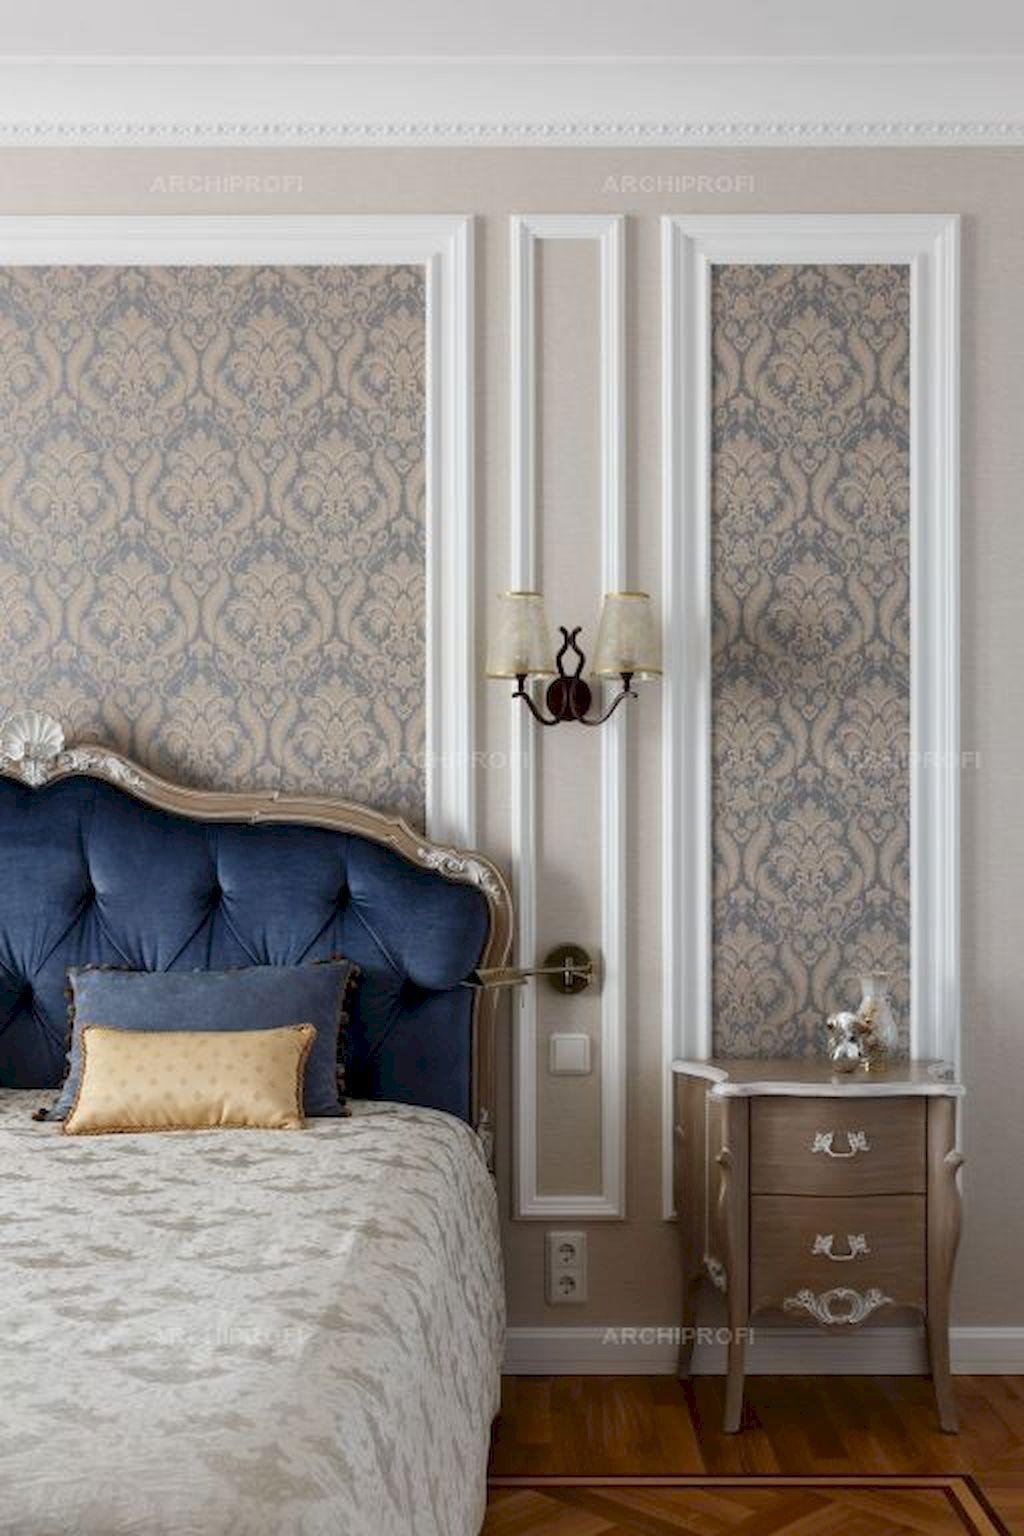 Bed Room Wall Decor Enjoyable Step For Your Distinctive Model En